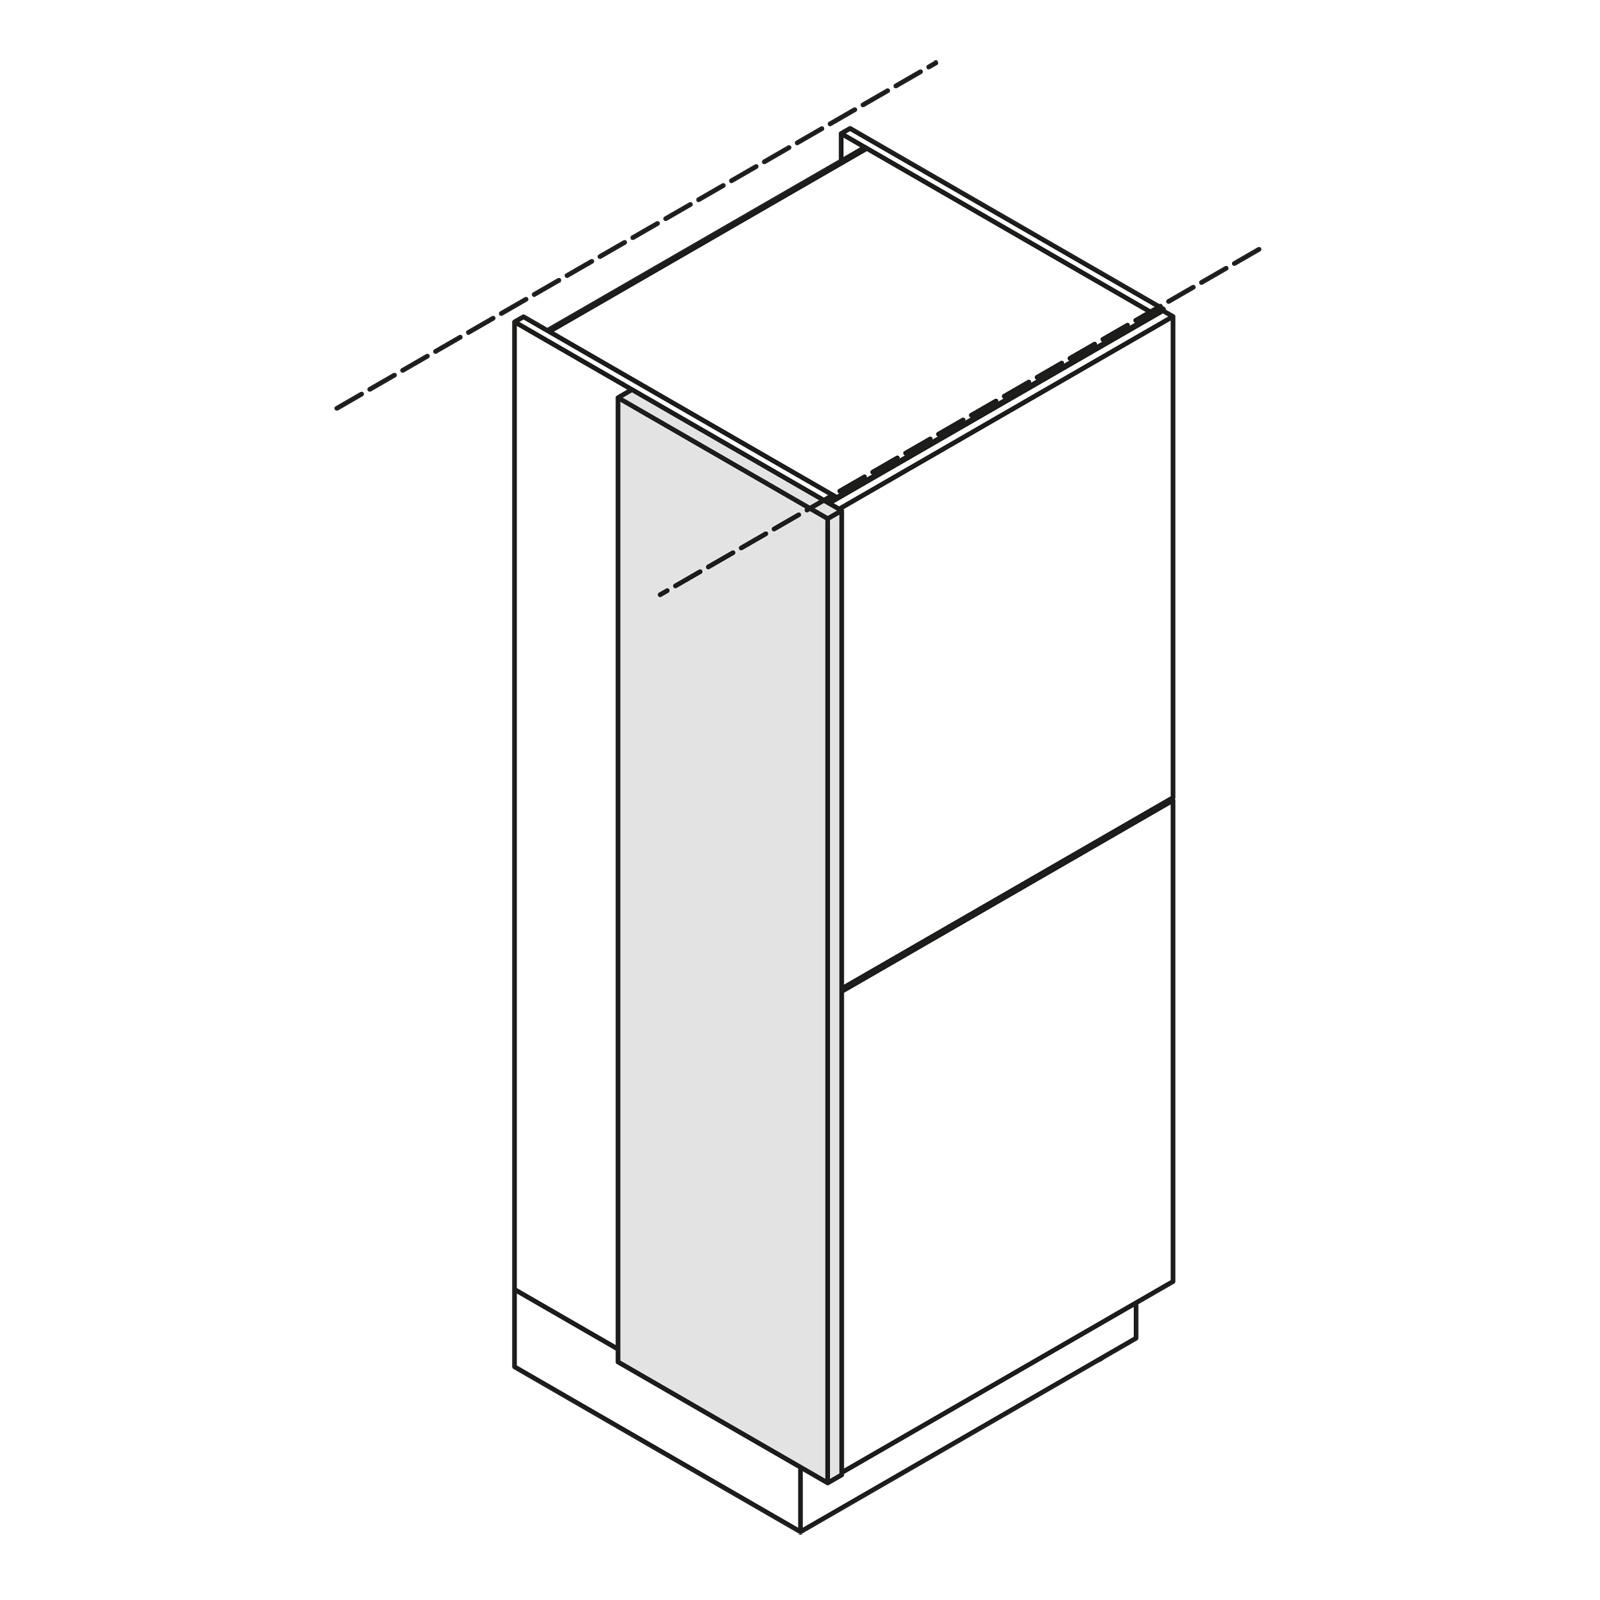 nolte k chen wange korpushoch w5 ze150 39. Black Bedroom Furniture Sets. Home Design Ideas